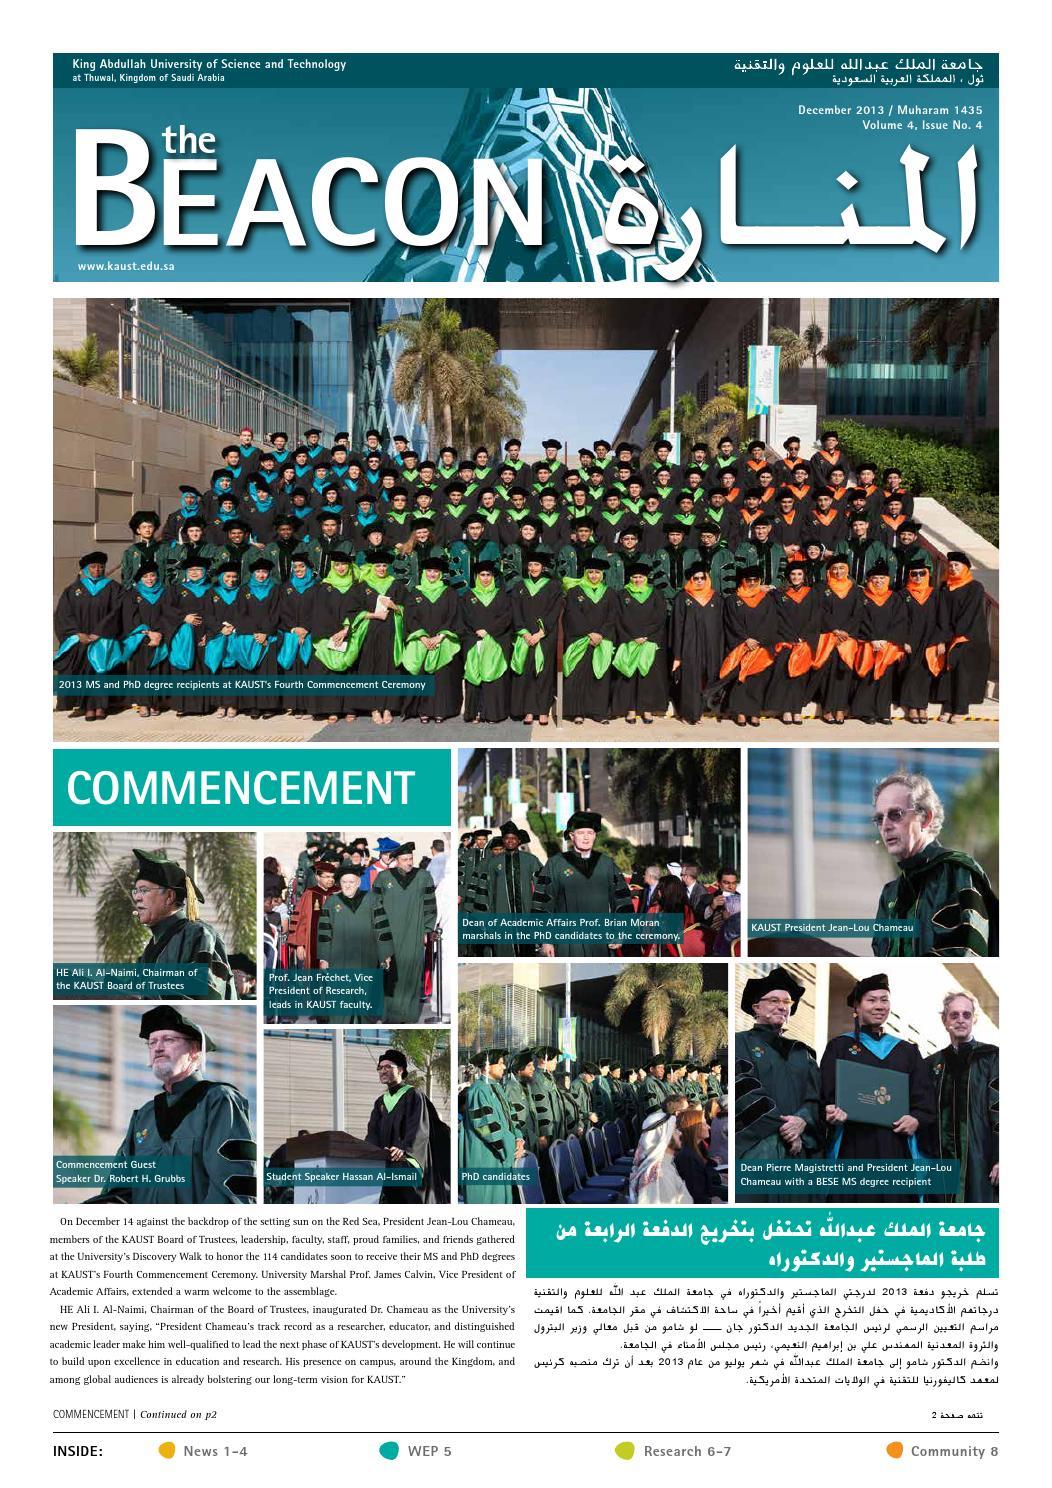 107b699dc249d 2013 December Beacon. The Beacon Newspaper